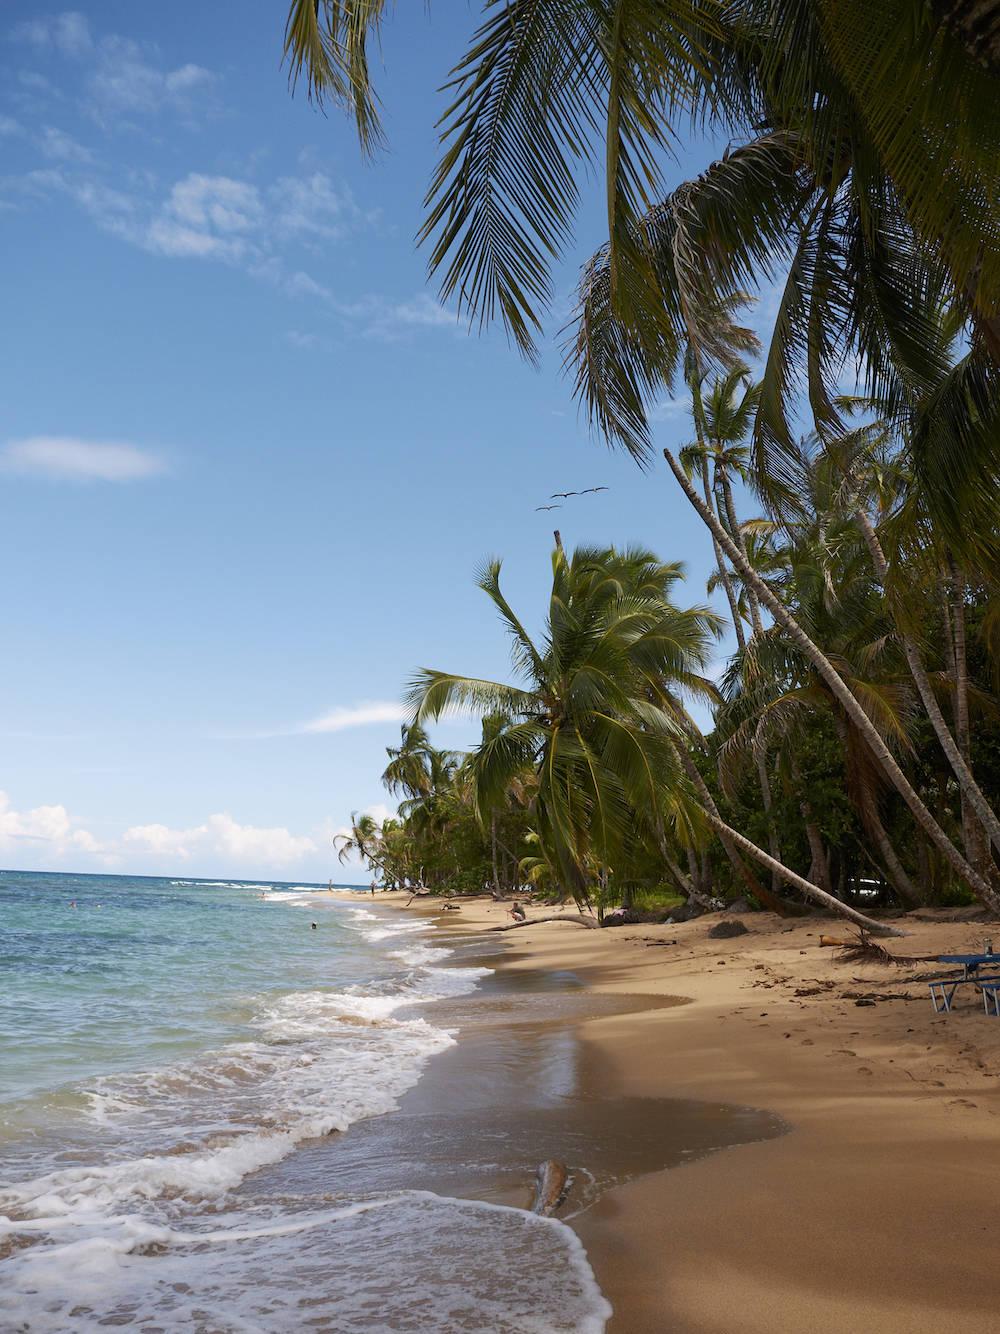 Der Strand Punta Uva in Costa Rica